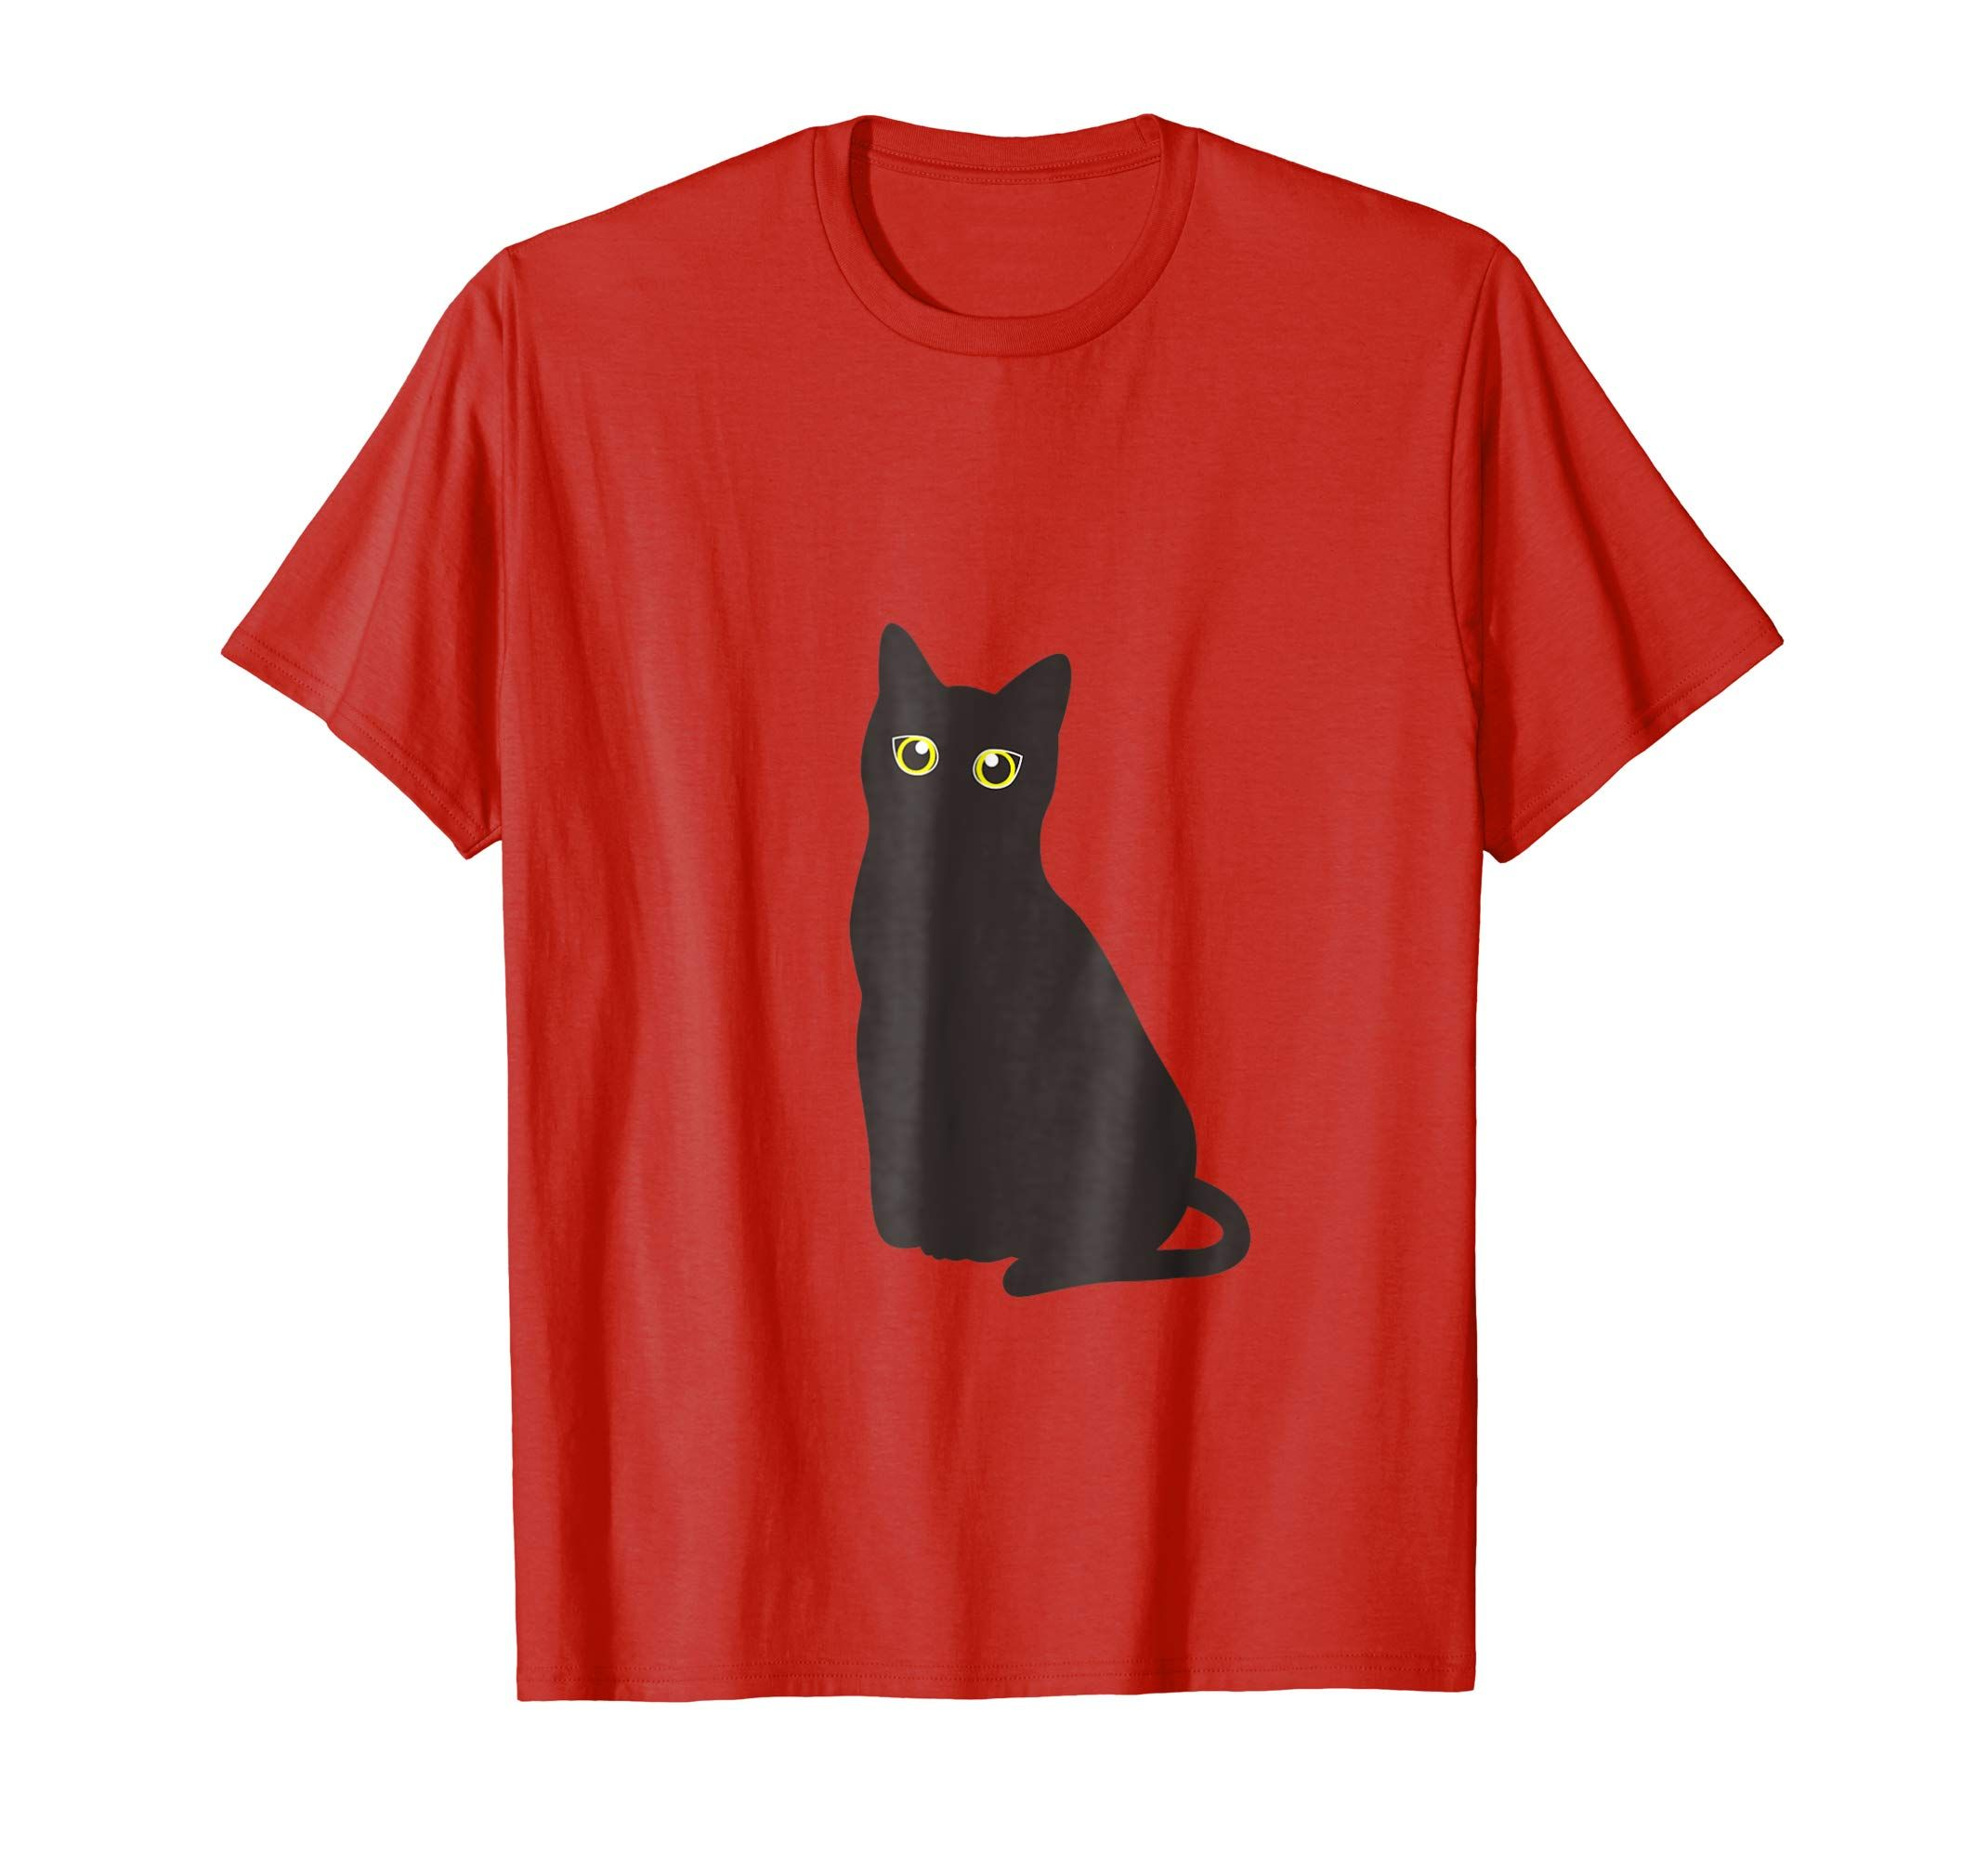 Amazon Com Cute Halloween Black Cat T Shirt With Bright Eyes T Shirt Clothing Cat Tshirt Black Cat Halloween Cute Halloween